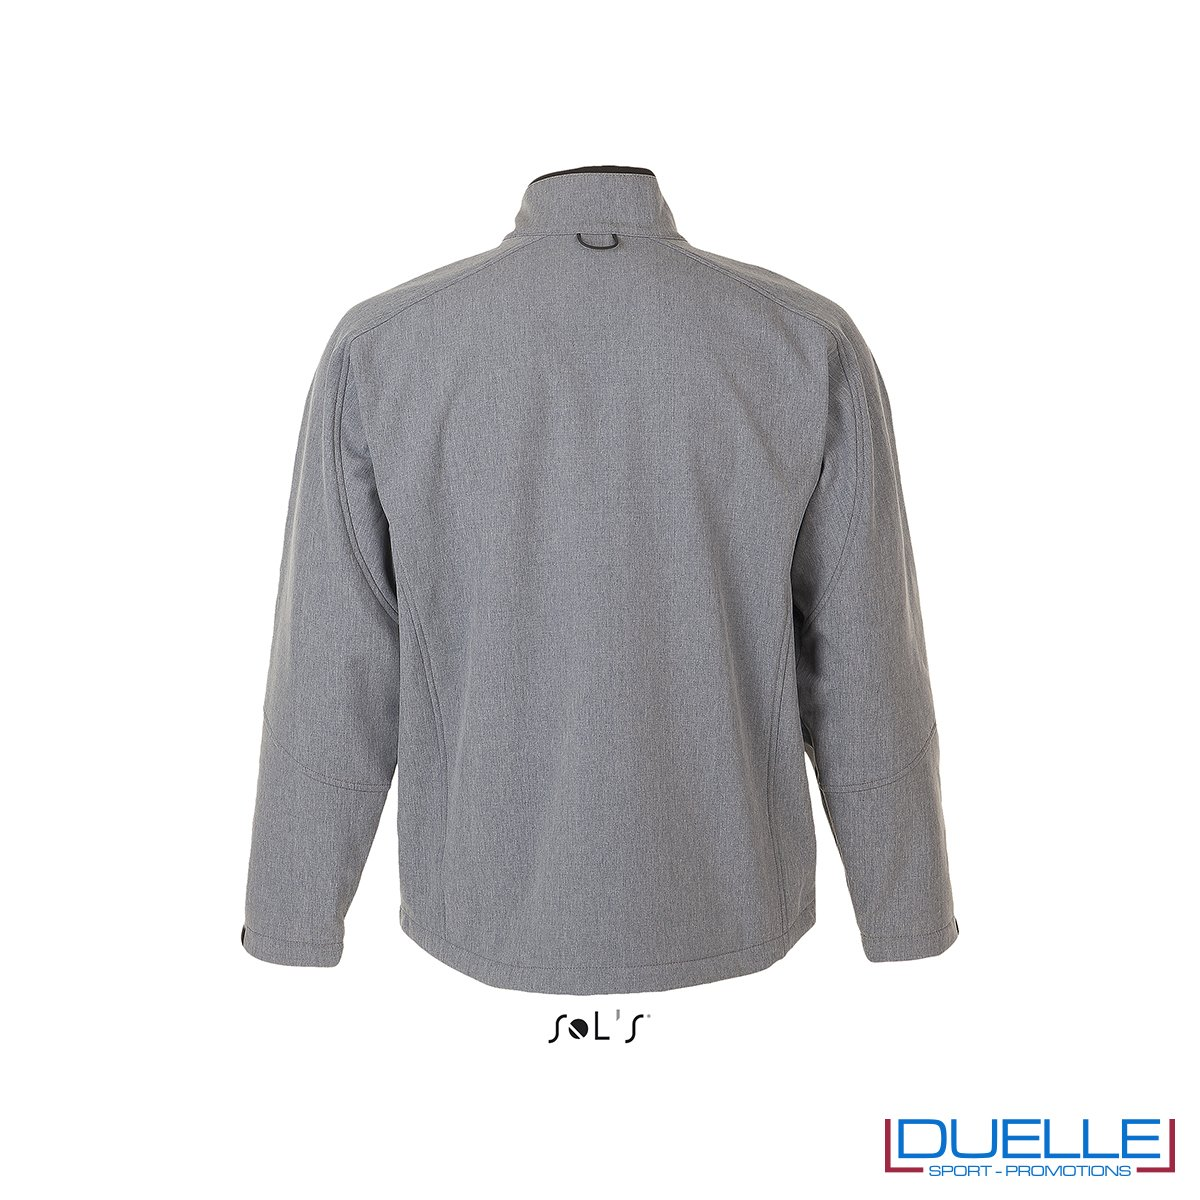 Schiena giacca softshell 3 strati